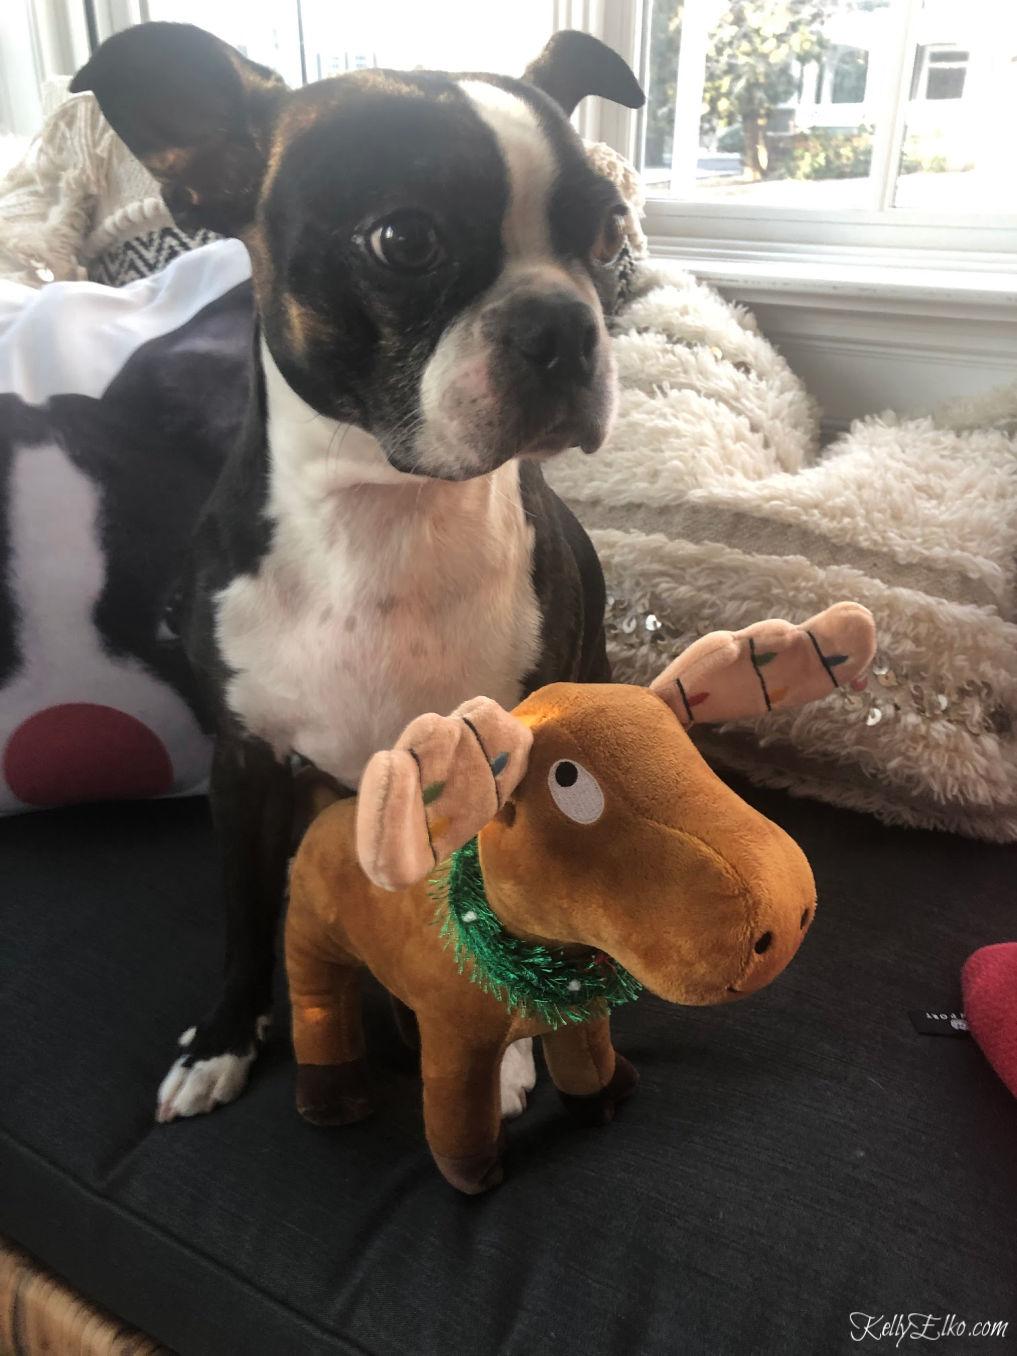 Boston Terrier with Christmas toy kellyelko.com #christmasdog #bostonterrier